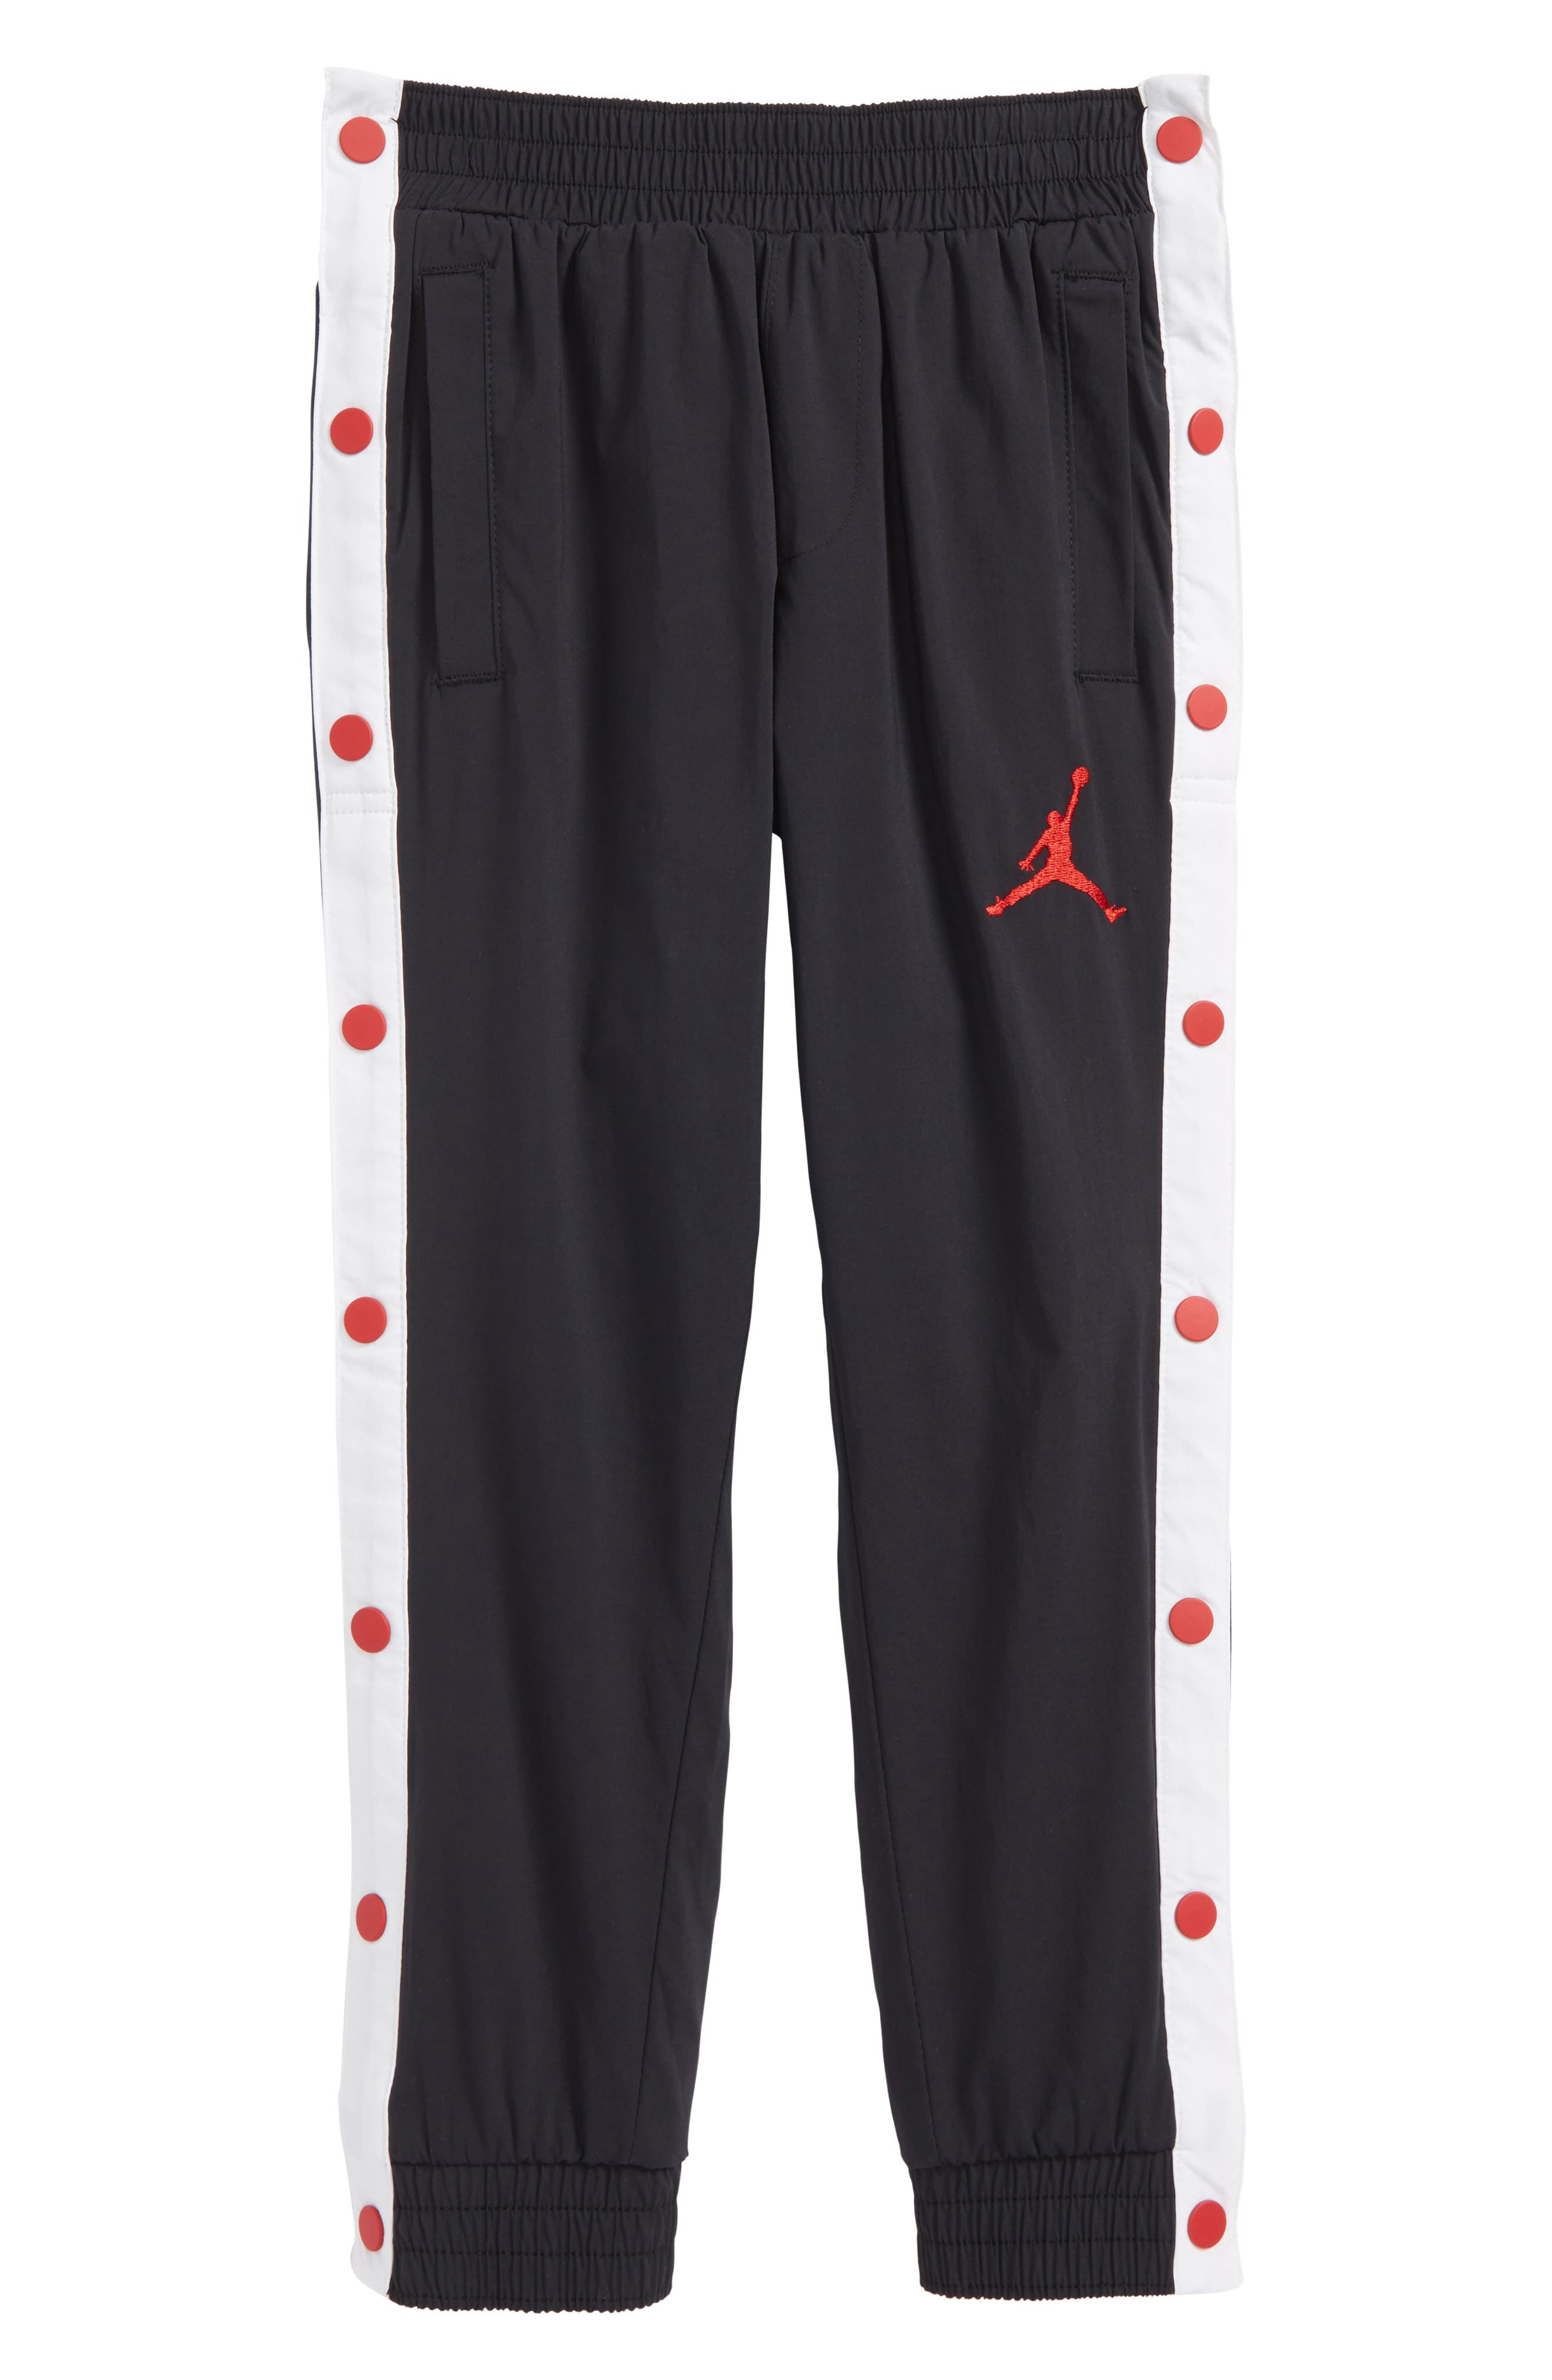 Jordan AJ '90s Snapaway Sweatpants,                             Main thumbnail 1, color,                             004